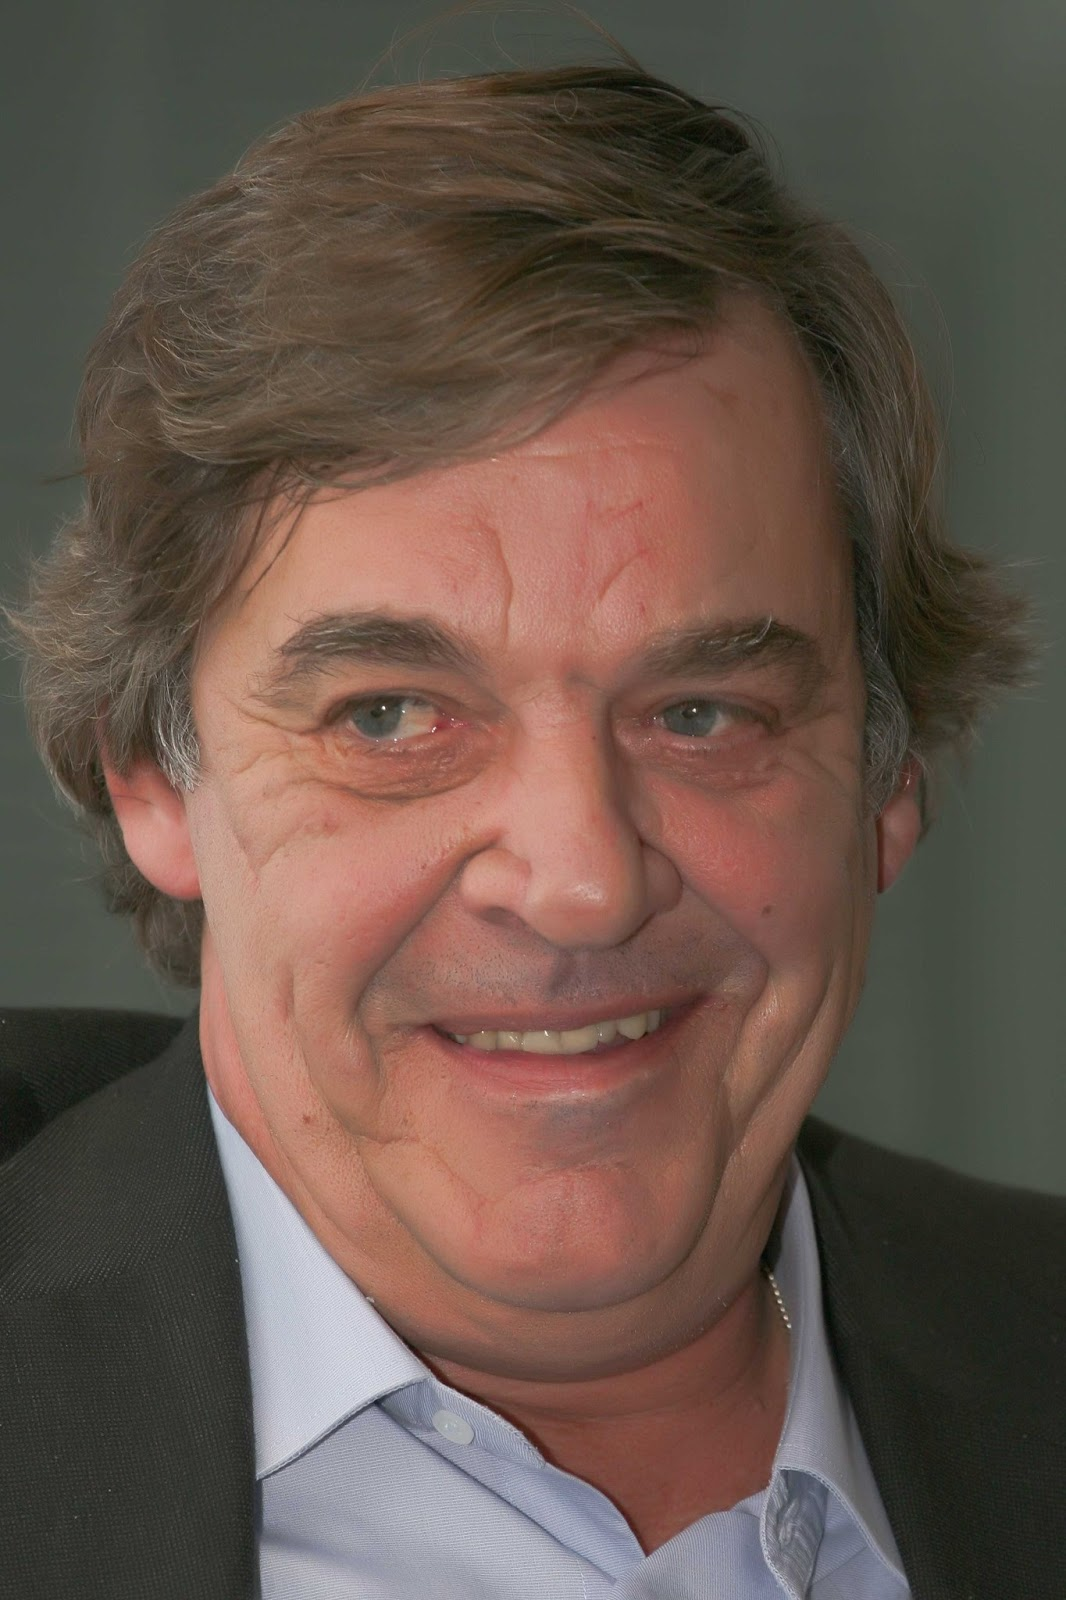 Miguel Sousa Tavares net worth